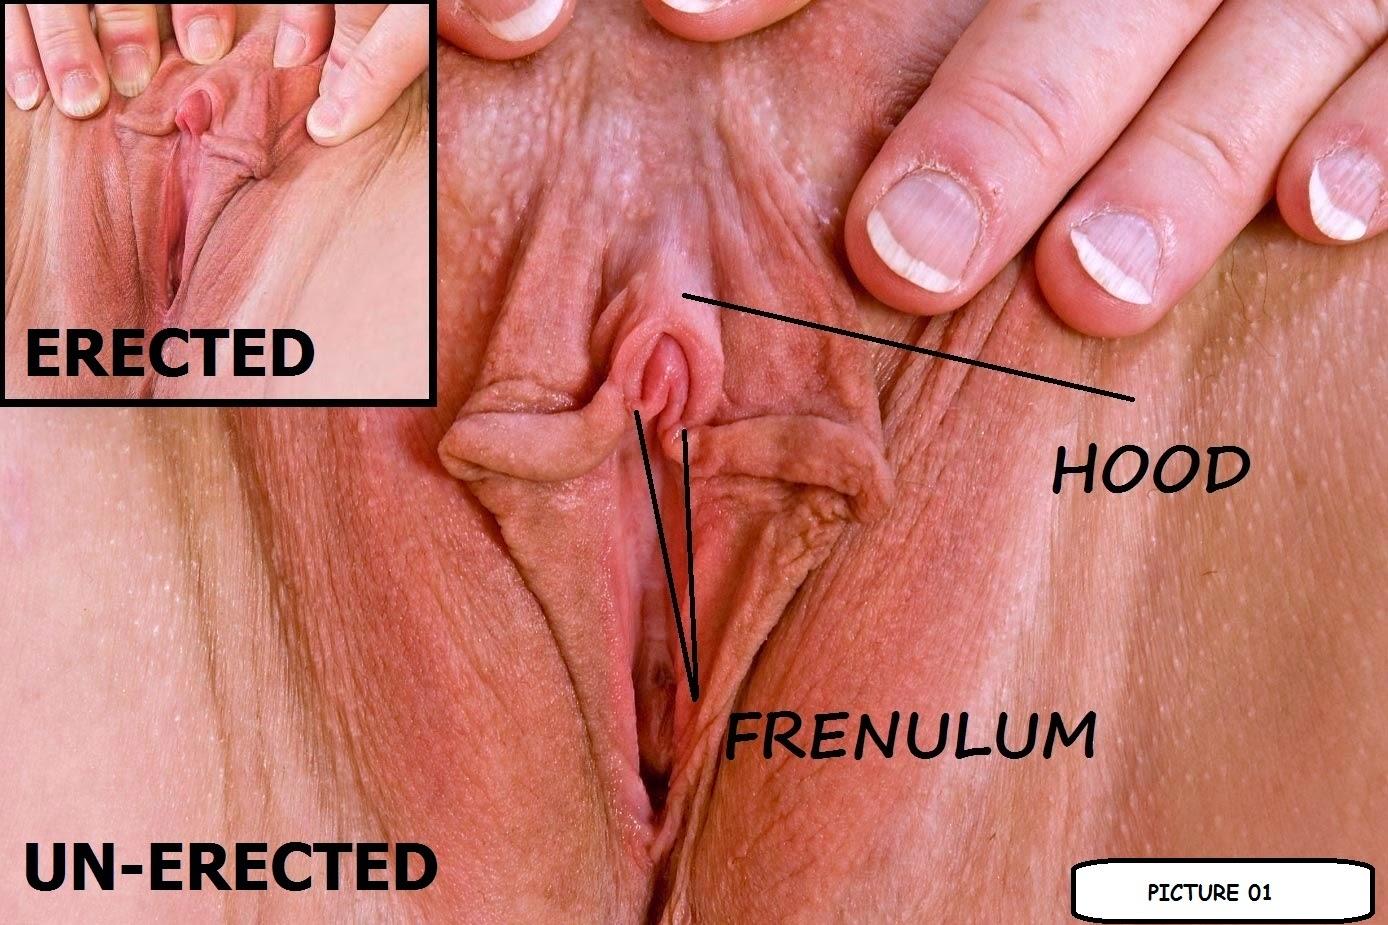 Erect Clitoris